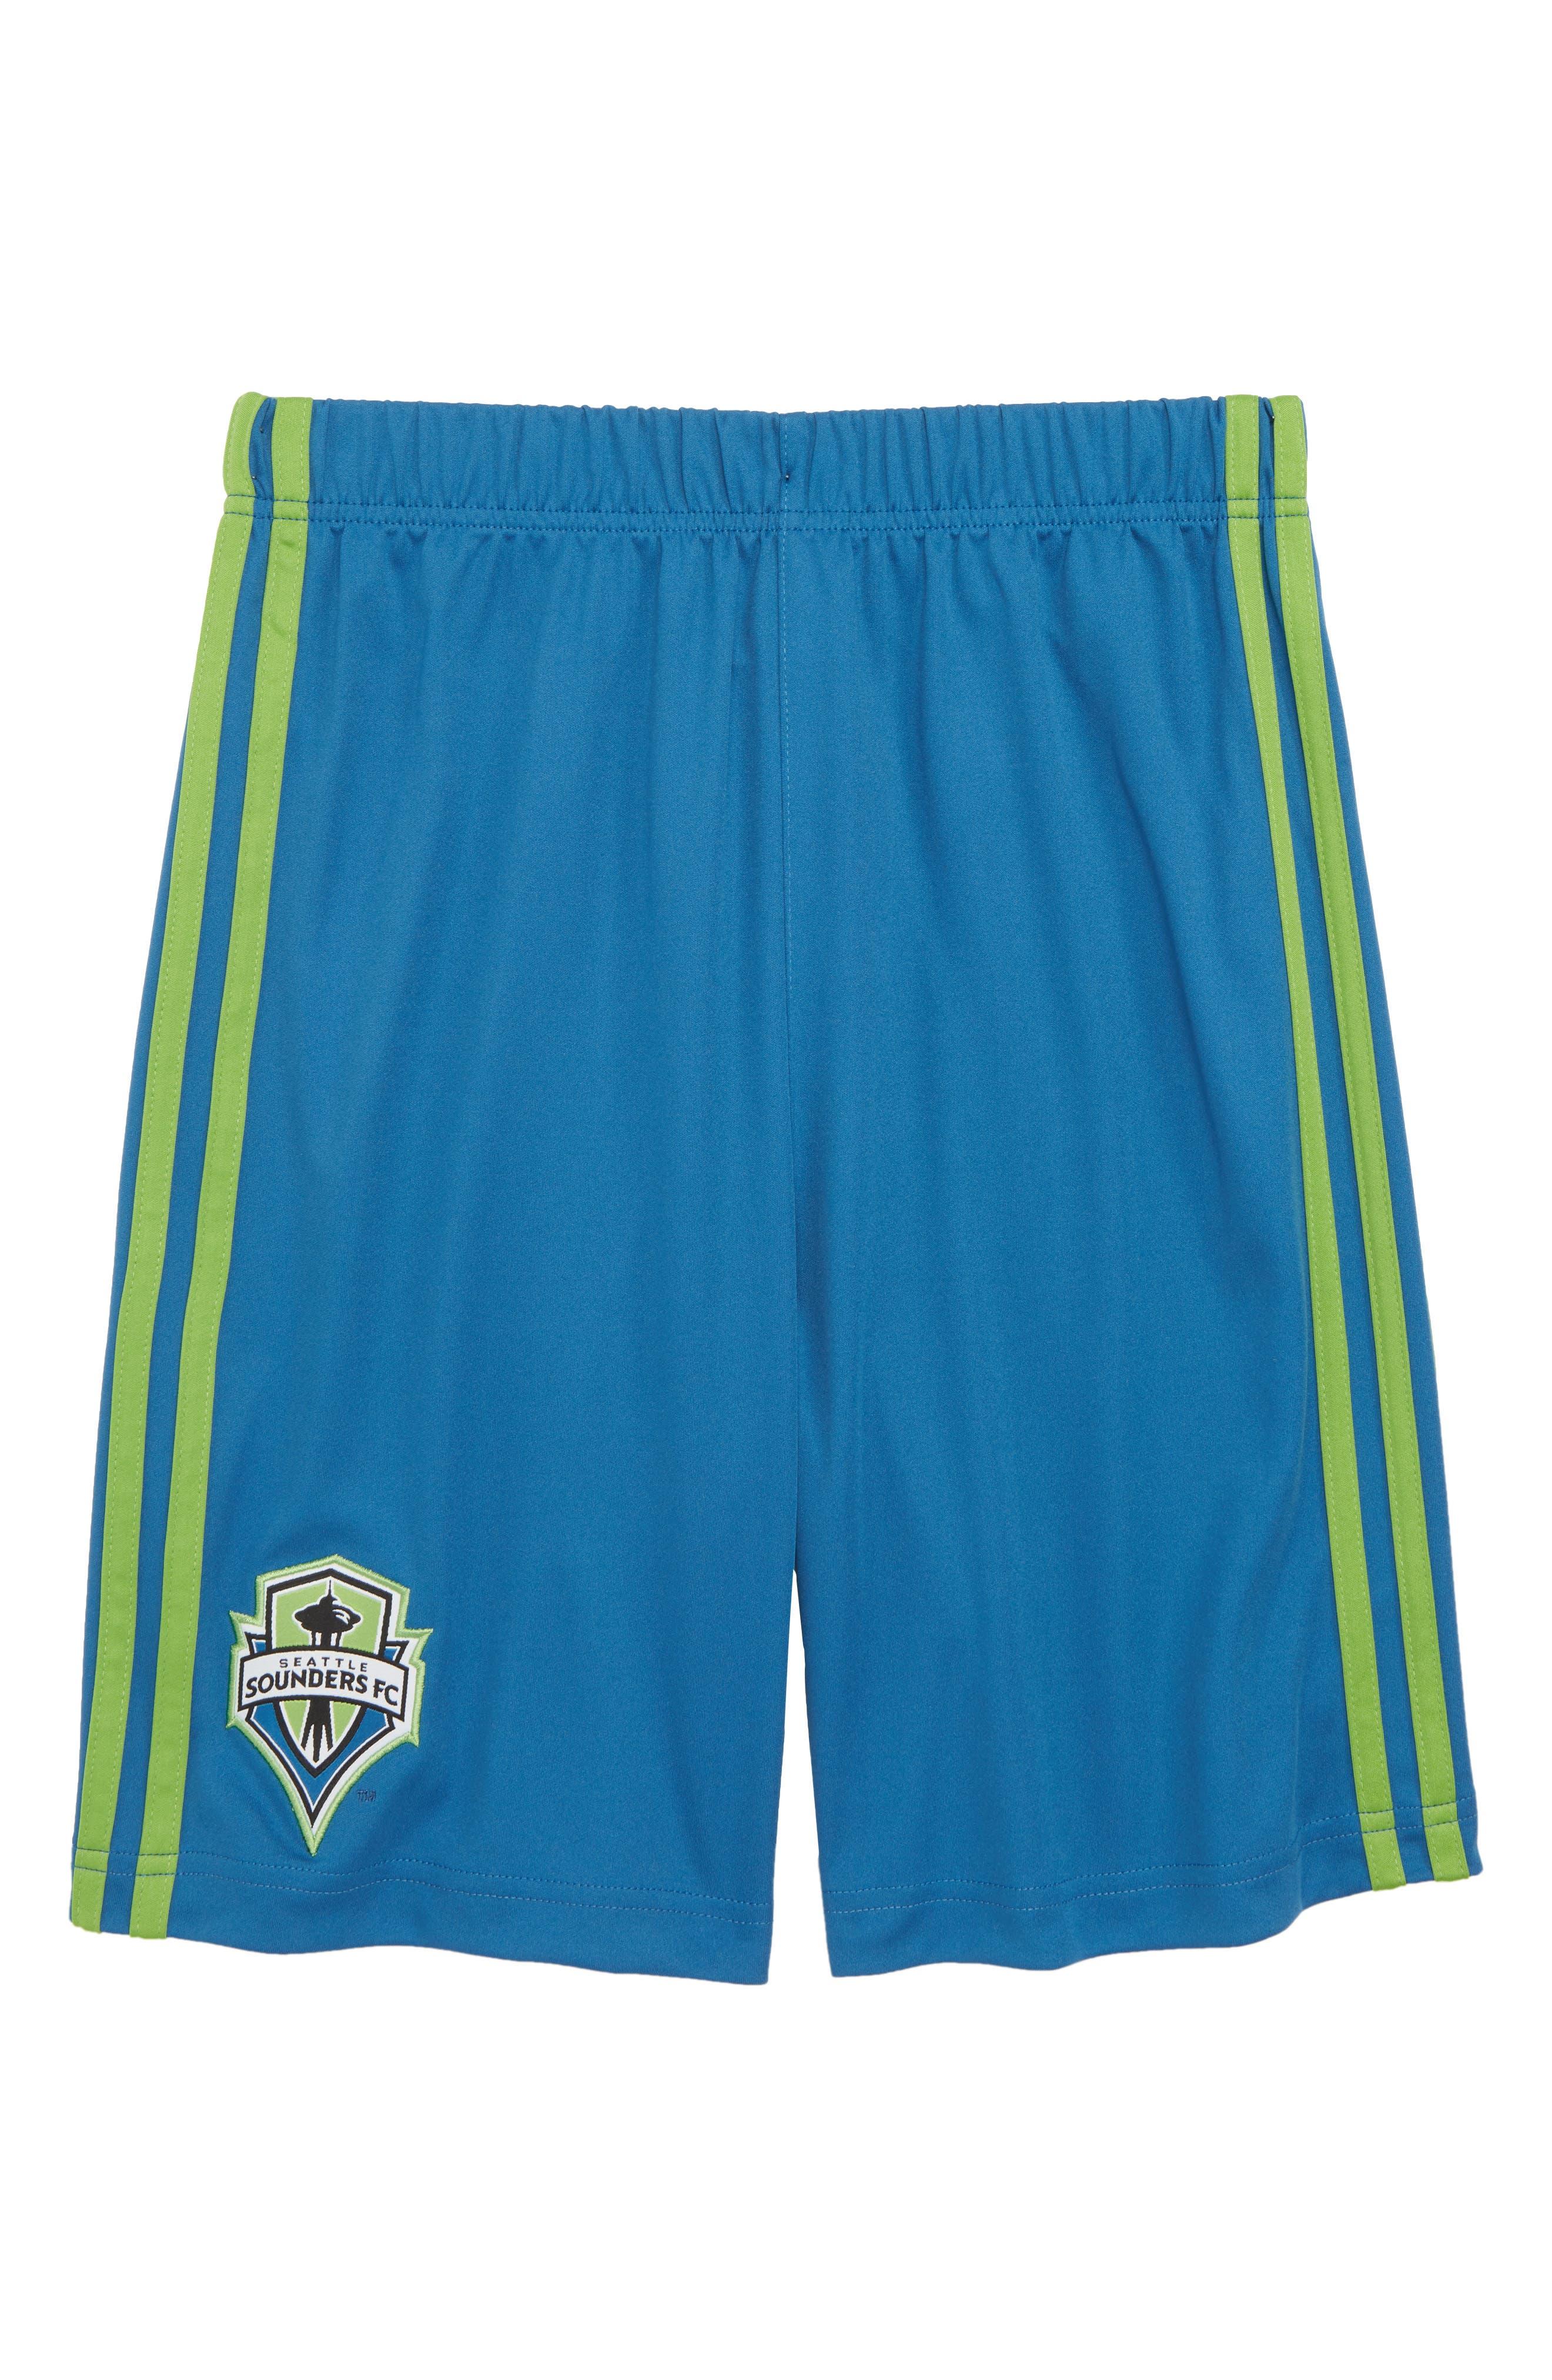 Alternate Image 1 Selected - adidas MLS Seattle Sounders FC Shorts (Big Boys)